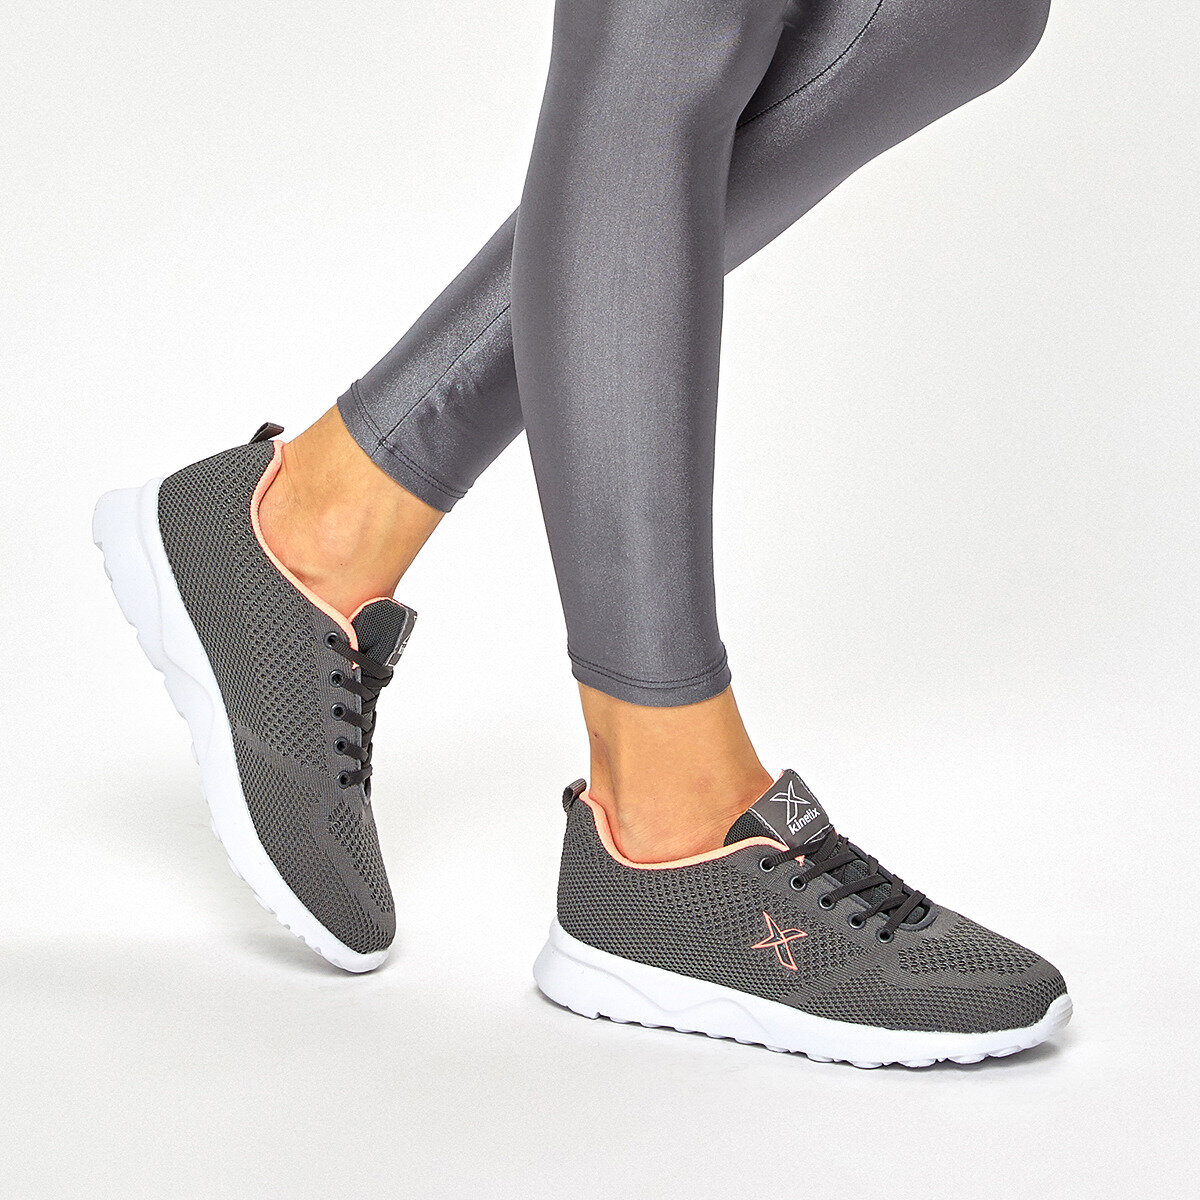 FLO FLUSE 9PR Gray Women 'S Sneaker Shoes KINETIX